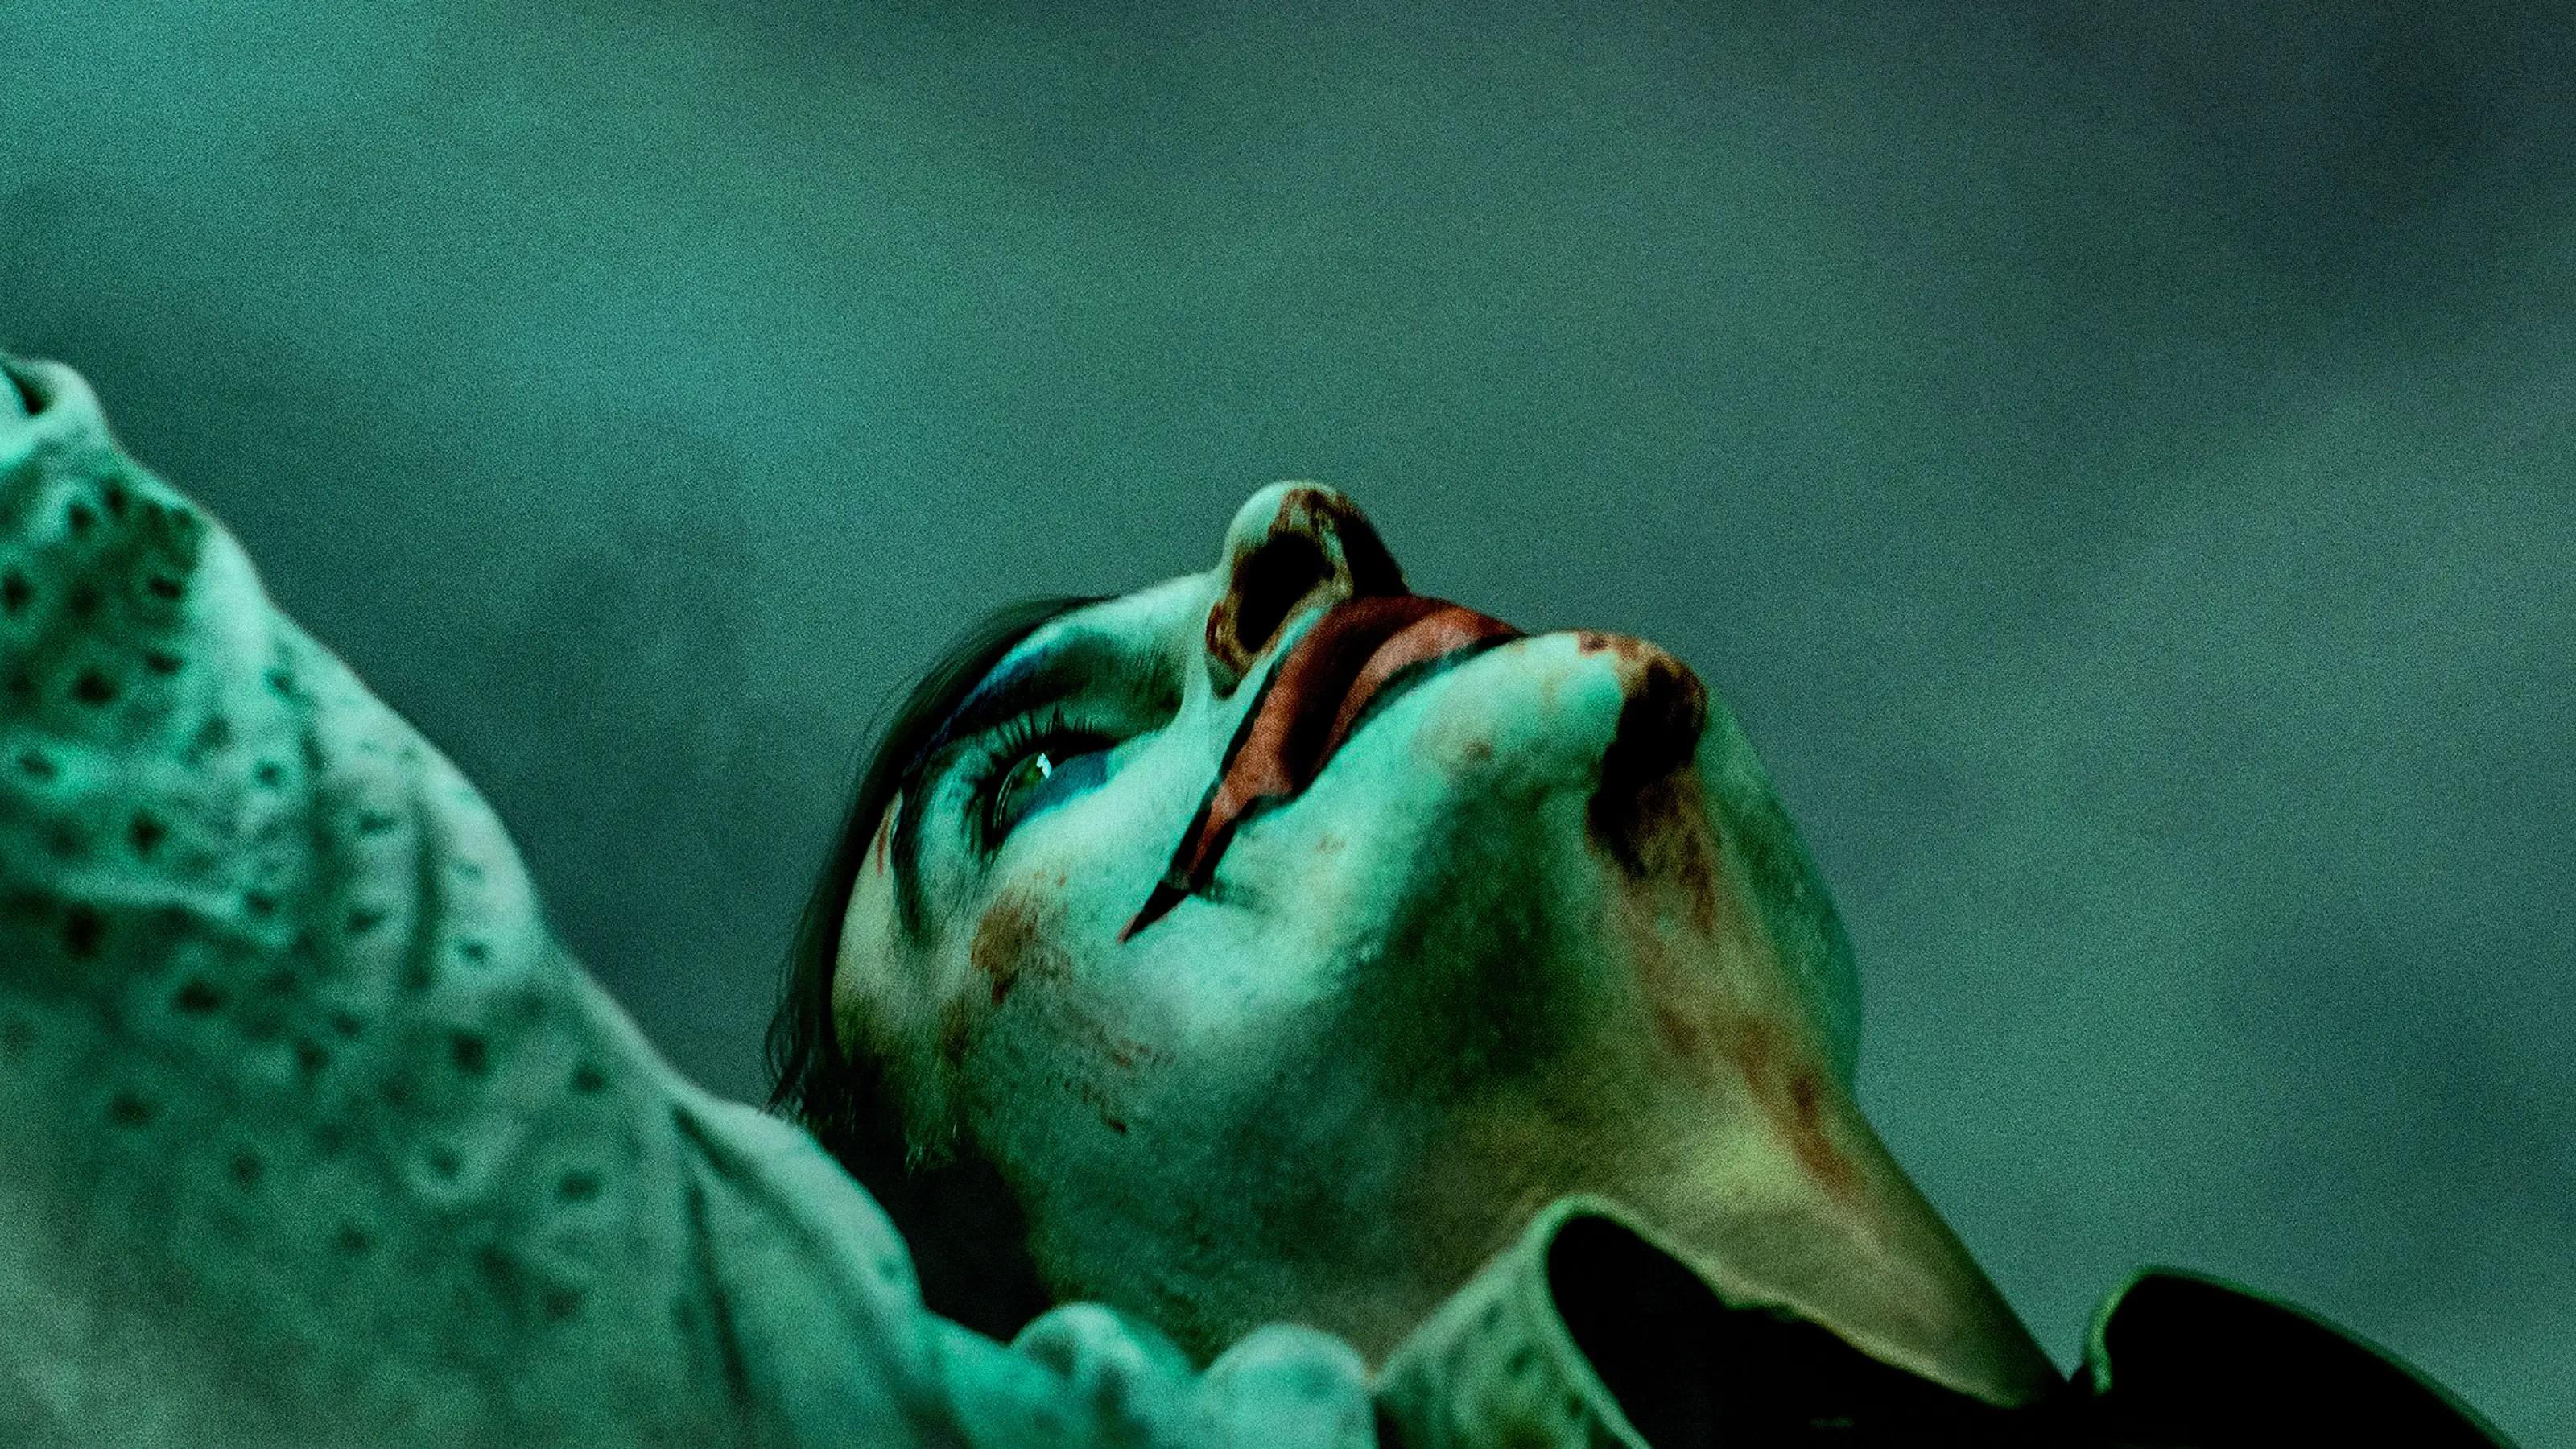 'Joker' review: Phoenix mesmerizes in this dark tale